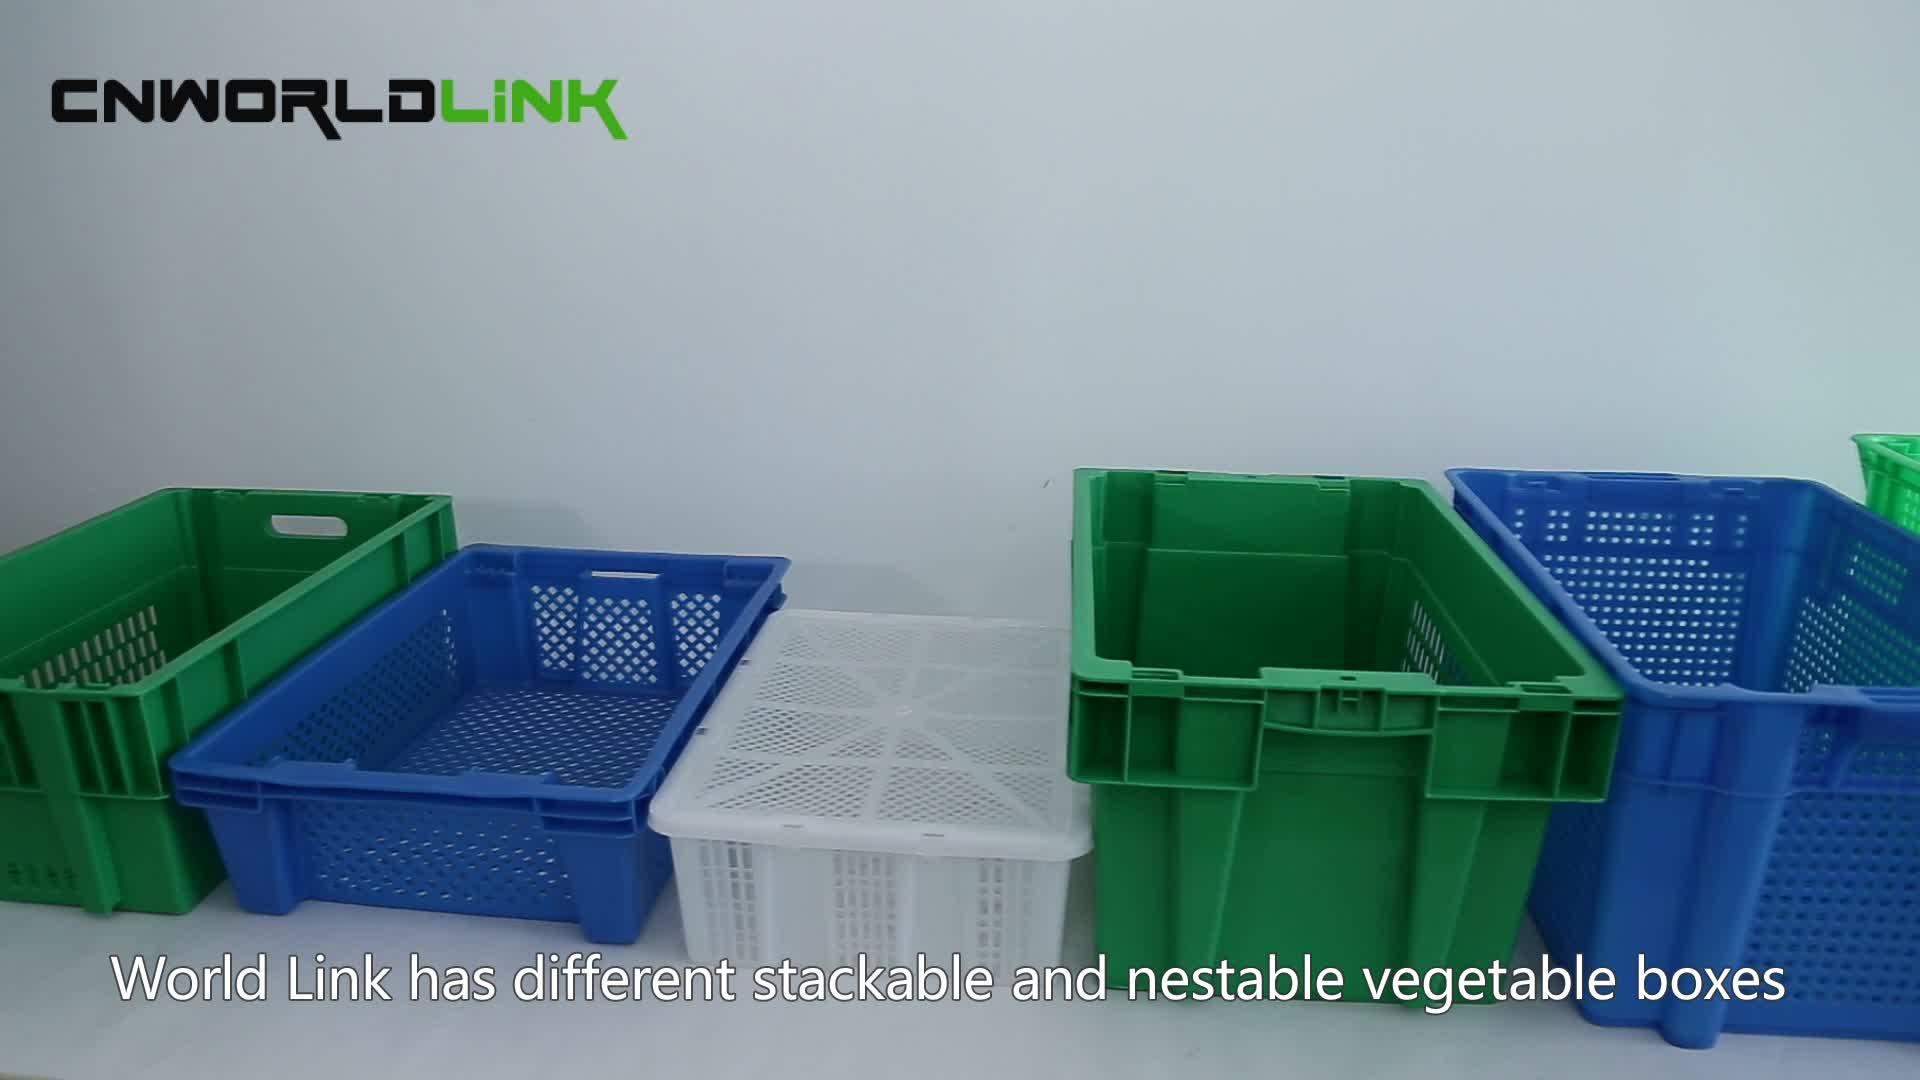 उच्च गुणवत्ता भंडारण फल और सब्जी प्लास्टिक निकाल टोकरा